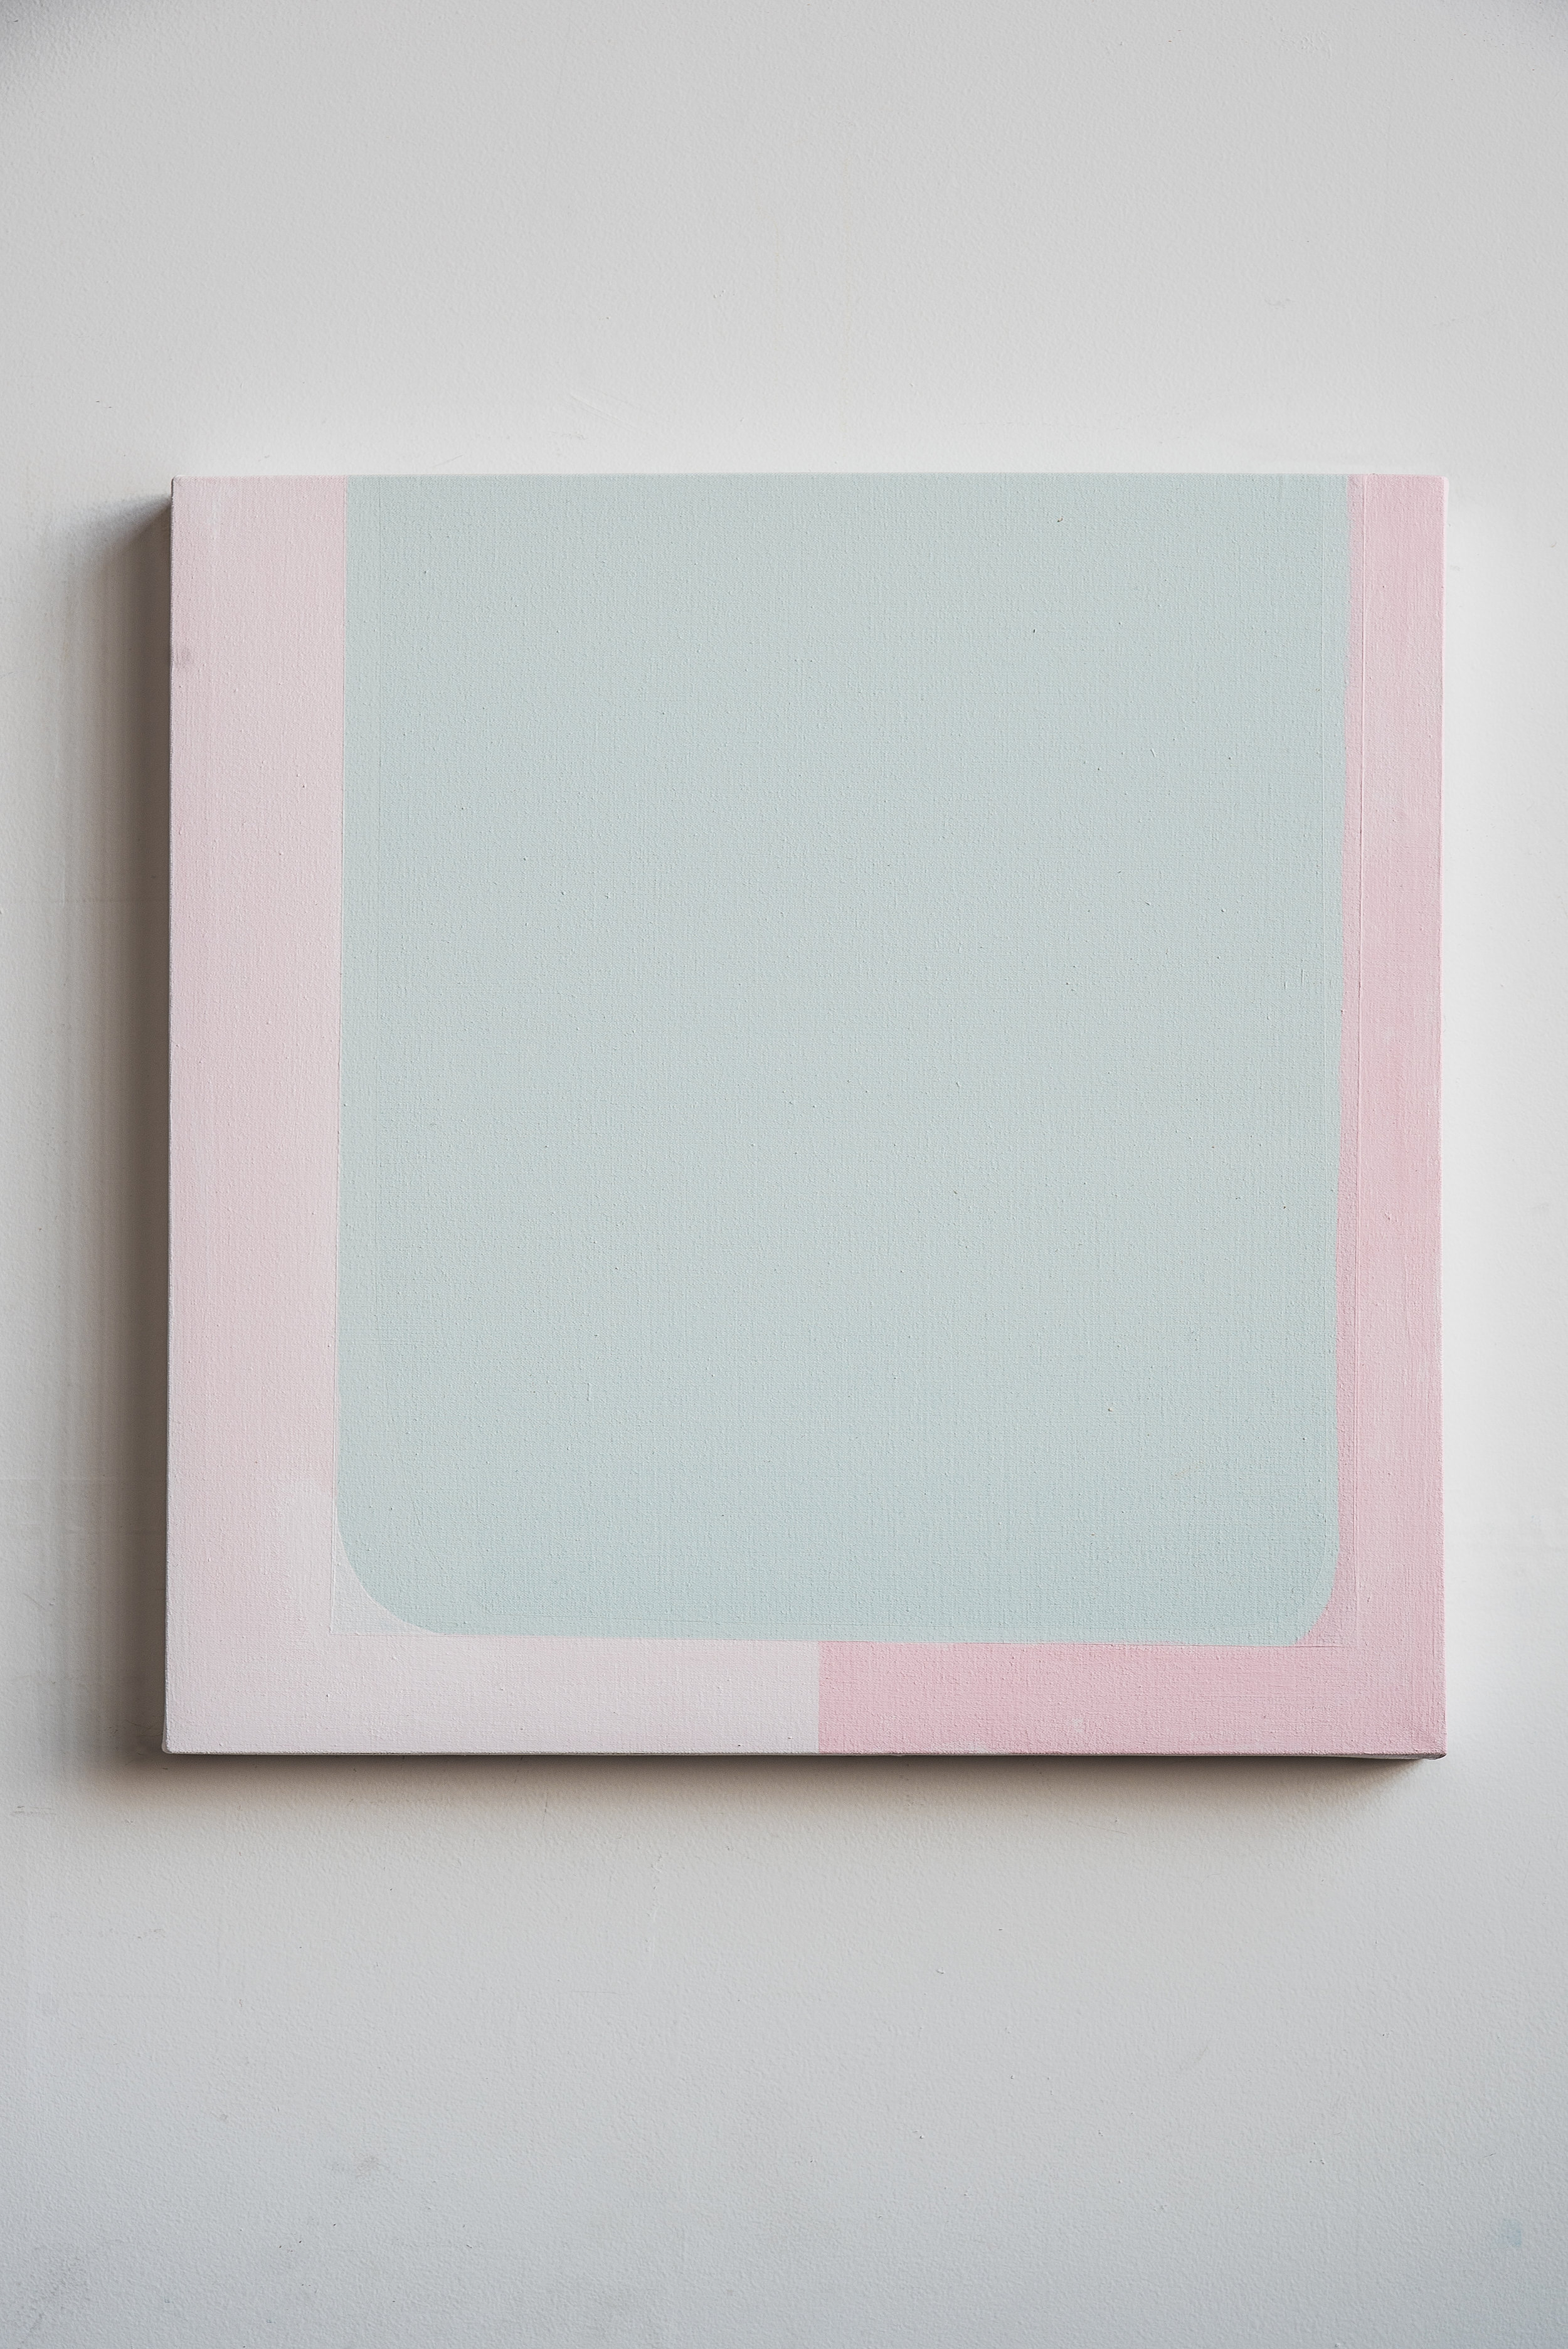 Sweet Radio Silence  Acrylic on canvas  24 x 24 in   2018